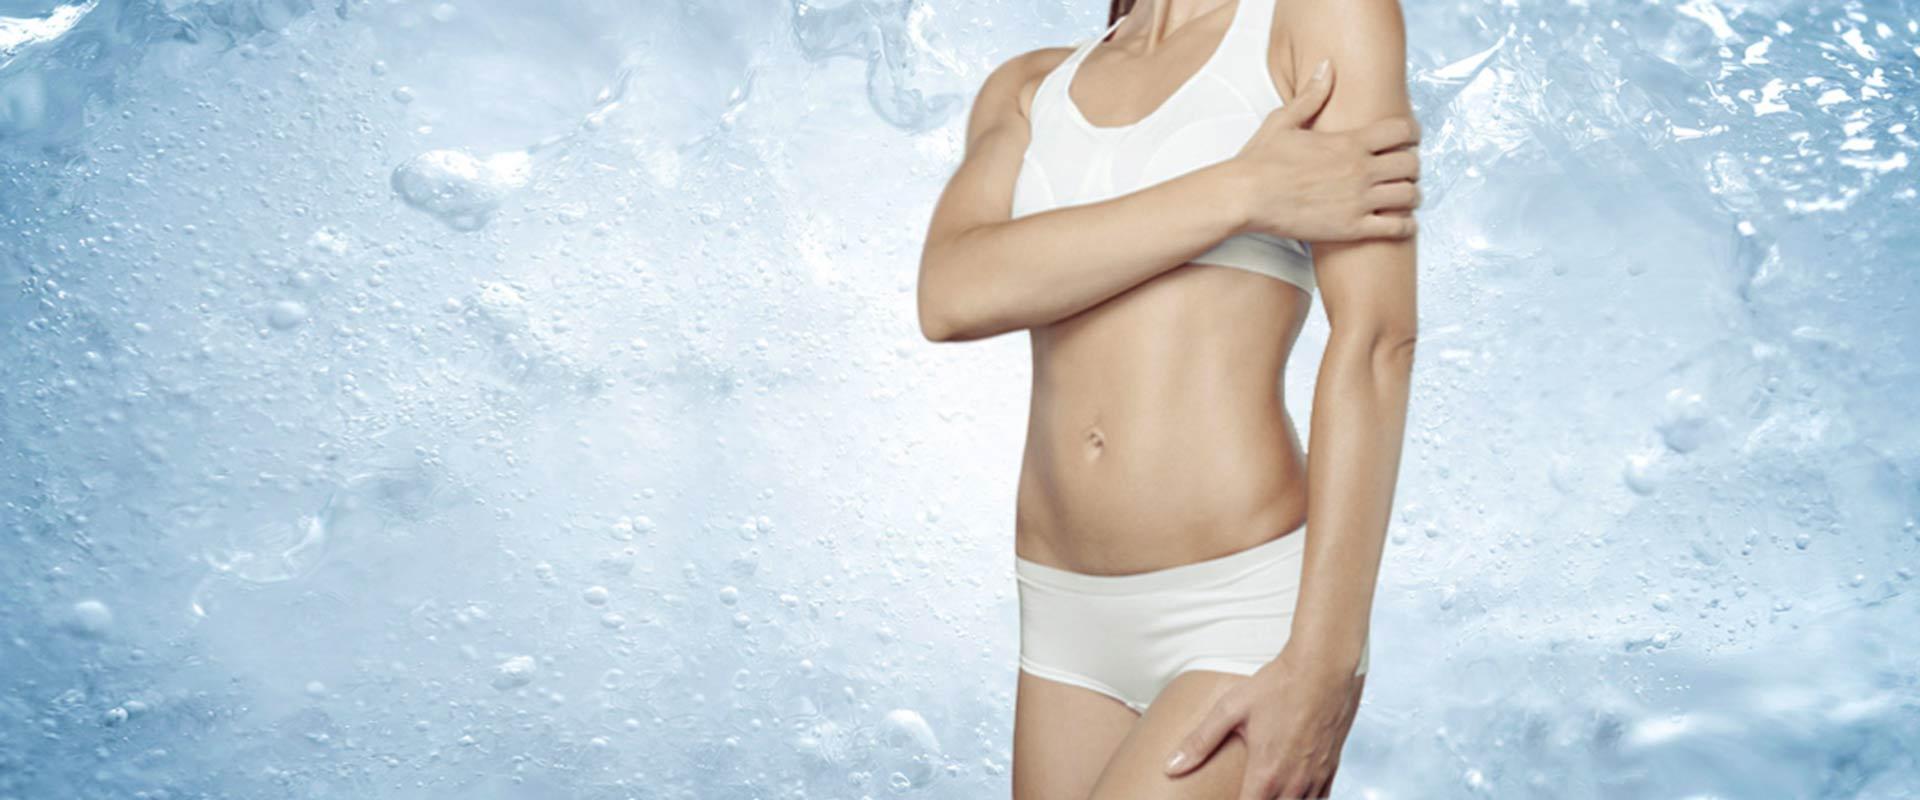 San-Marco-Wellness-iClub-Bergamo-Promo-Crioterapia